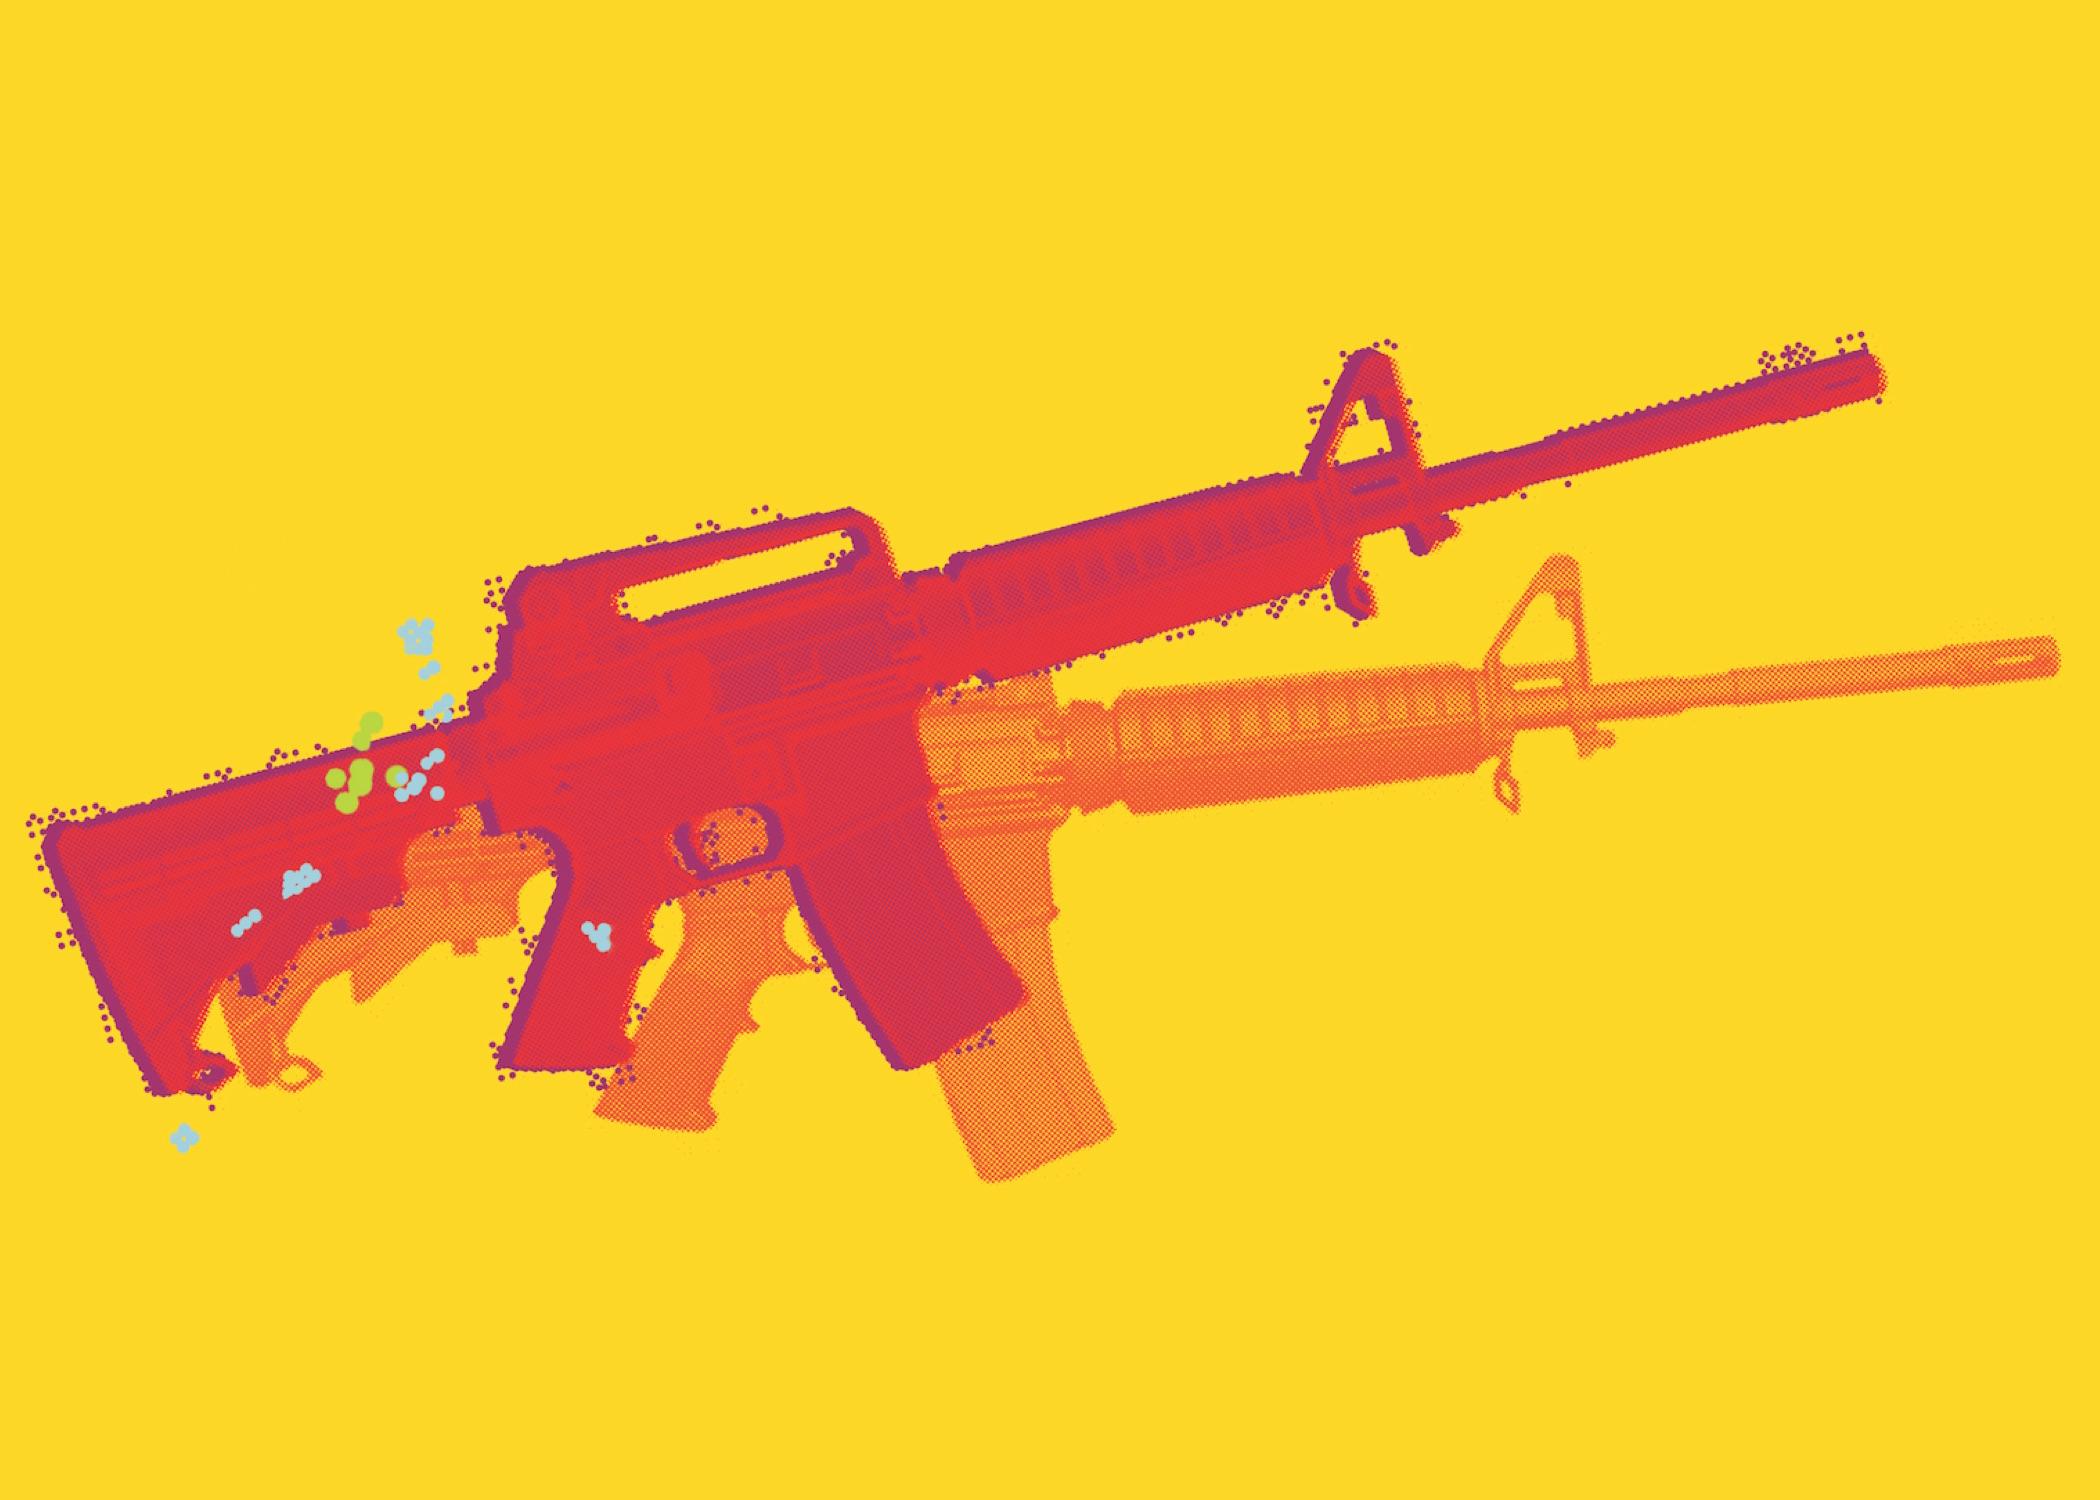 red and orange rifles